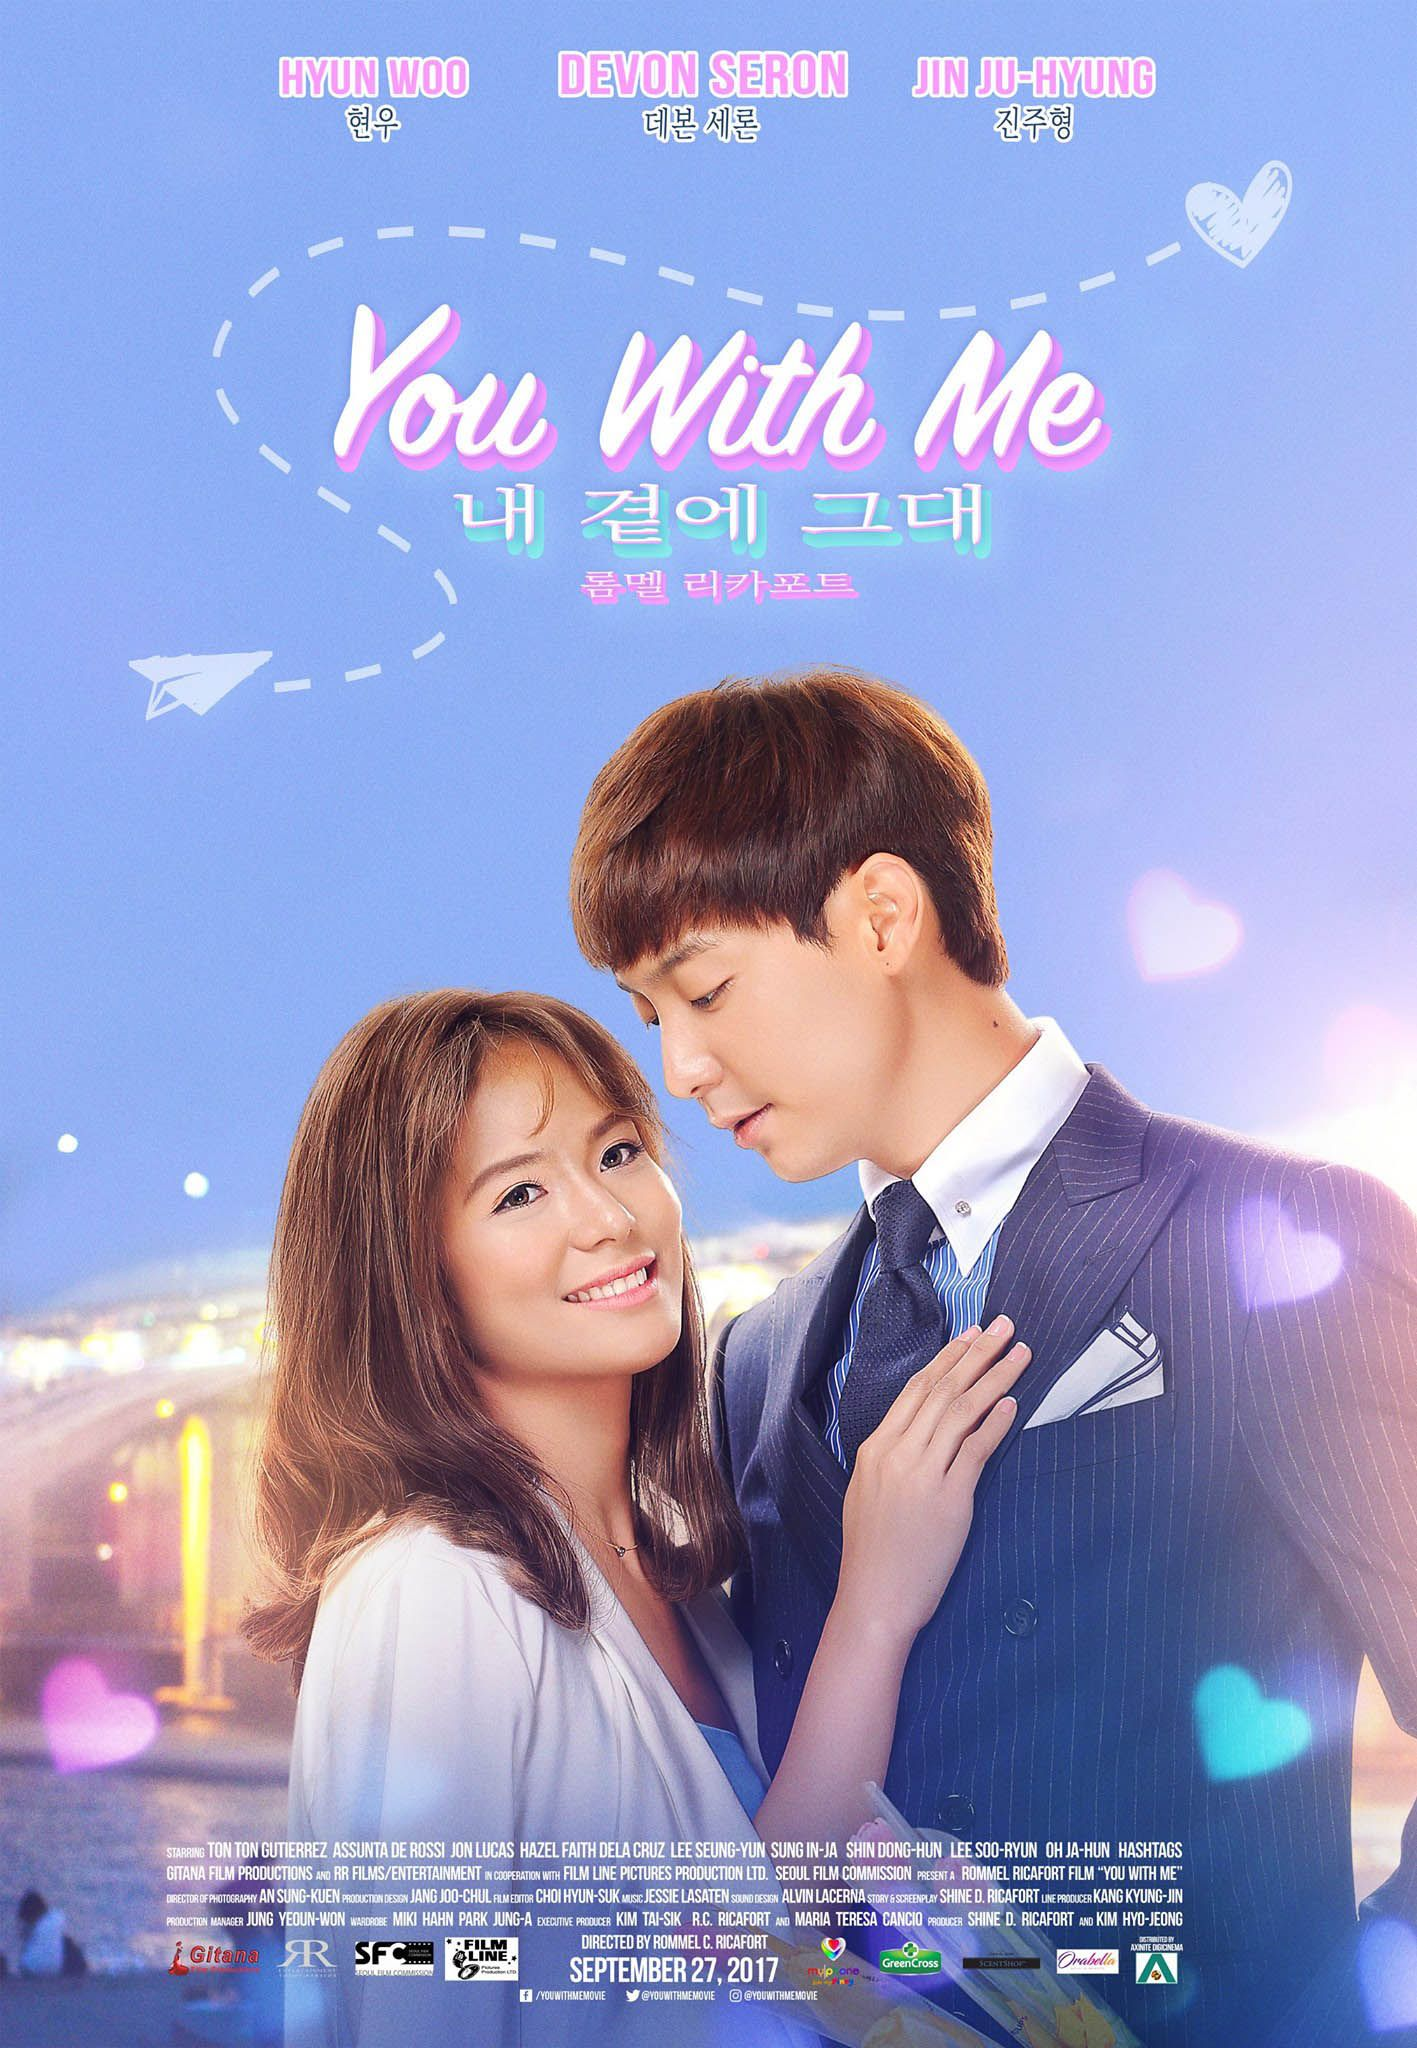 The First Filipino Korean Collaboration Film You With Me Hyun Woo Film Filipino